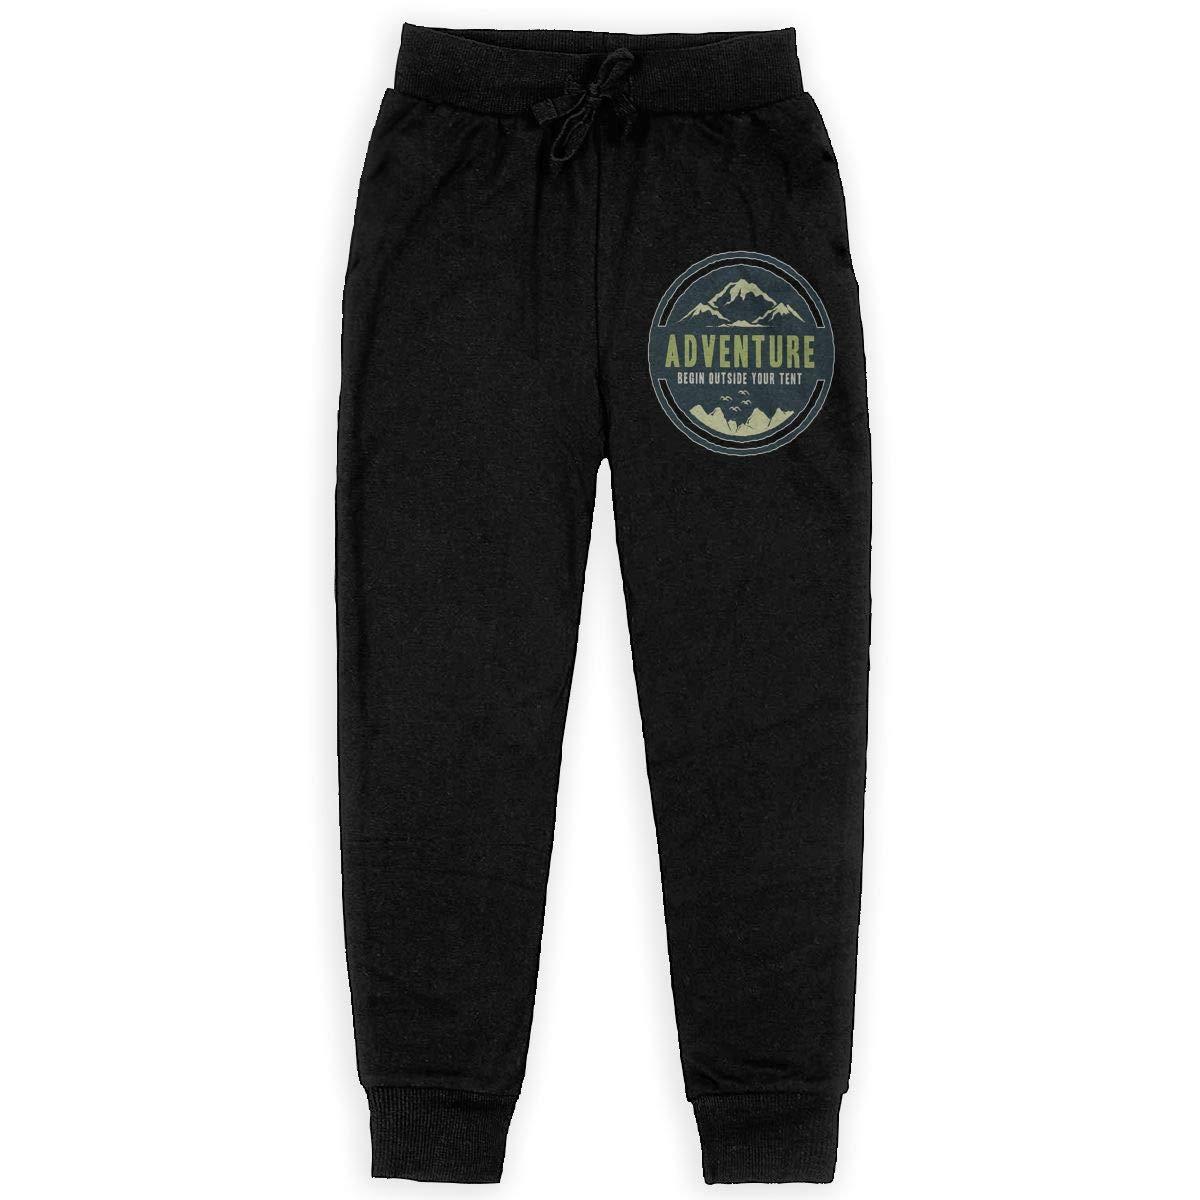 Kim Mittelstaedt Begin Outside Boys Big Active Basic Casual Pants Sweatpants for Boys Black